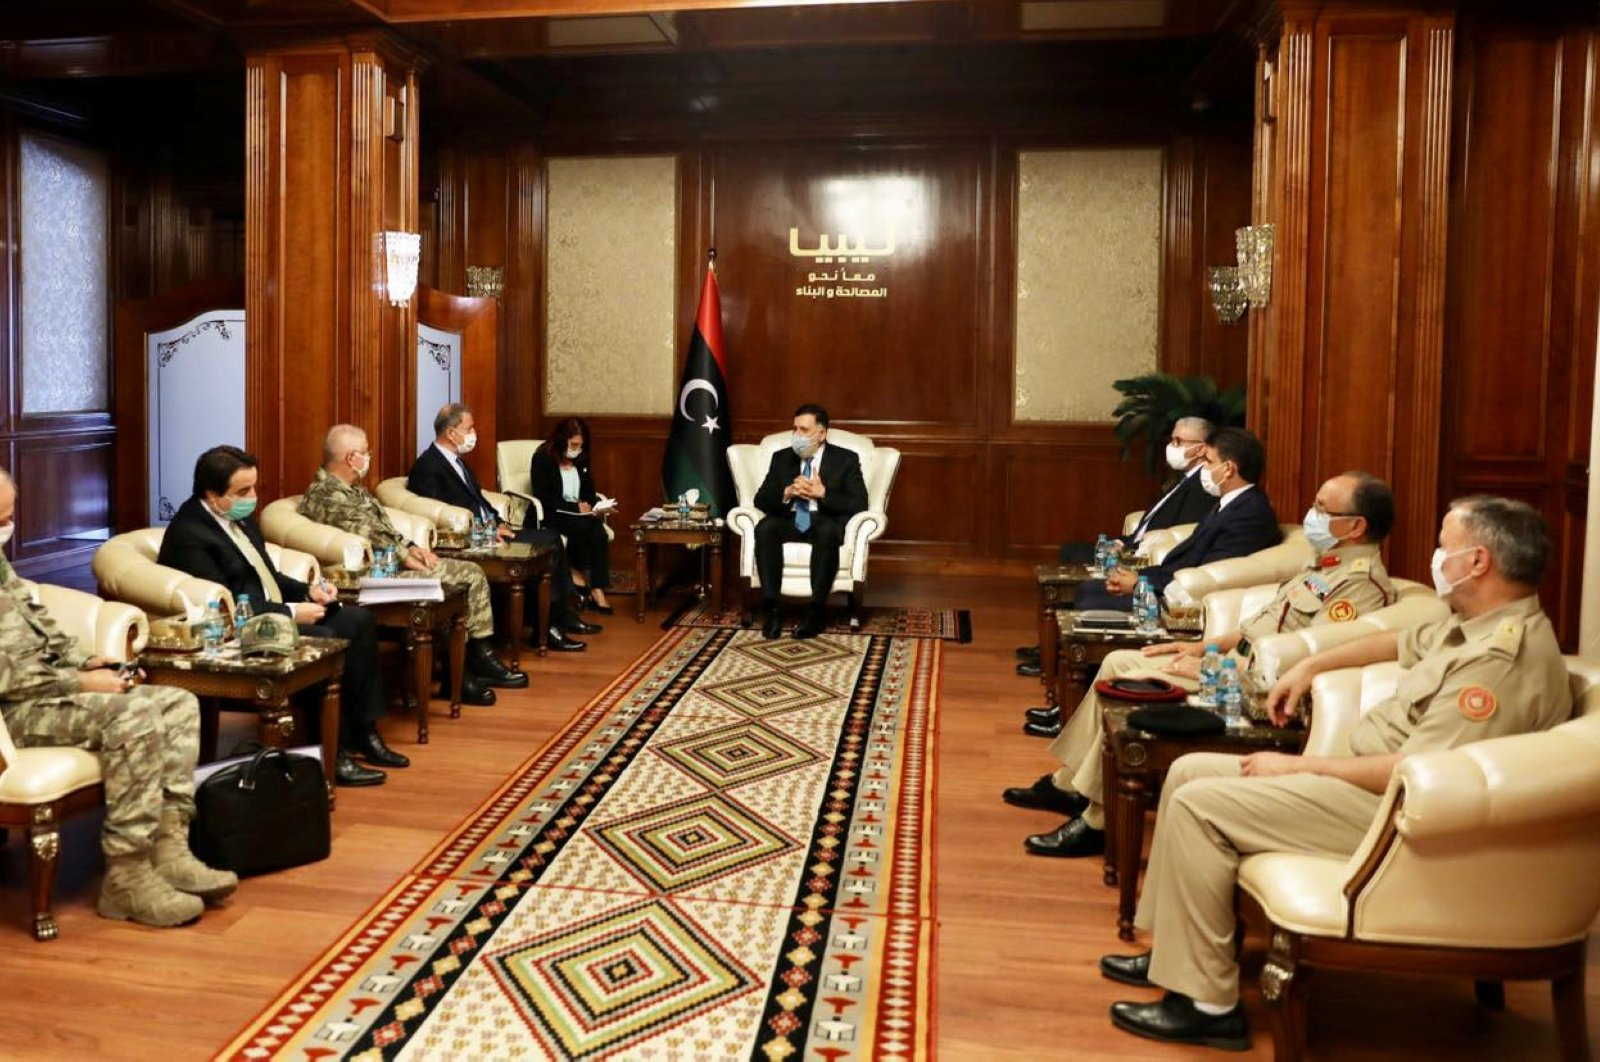 Defense Minister Hulusi Akar during a meeting with Libya's internationally recognized Prime Minister Fayez al-Sarraj in Tripoli, Libya, July 3, 2020. (Reuters Photo)